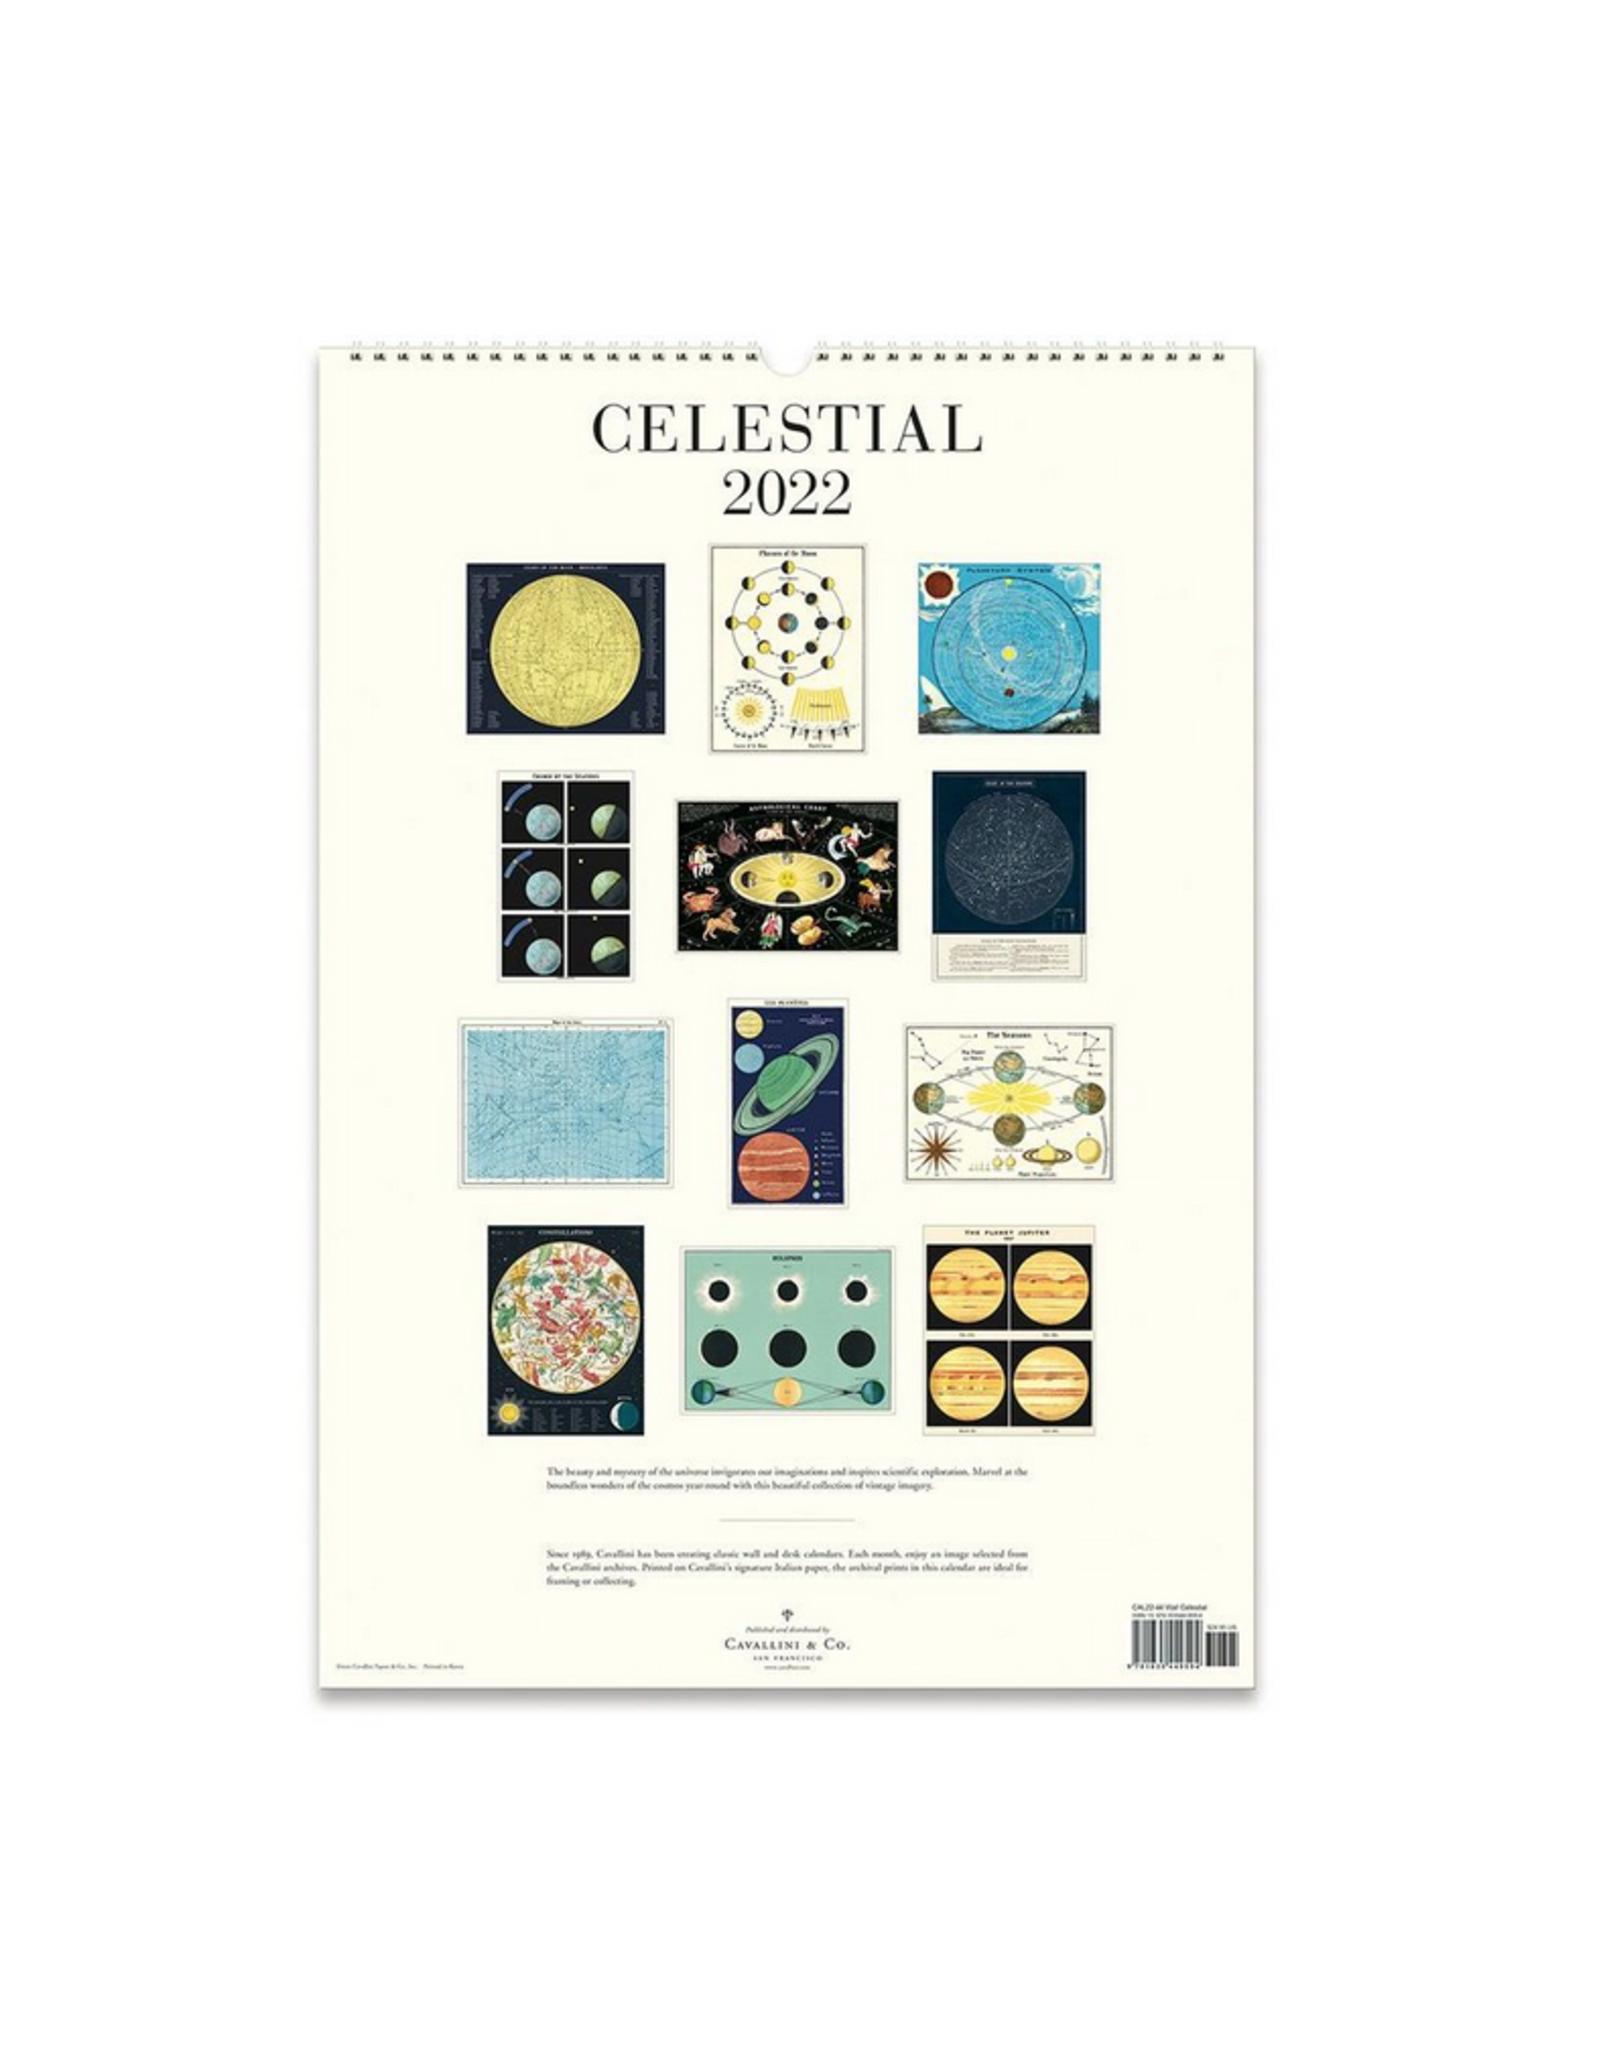 2022 Wall Calendar : Celestial